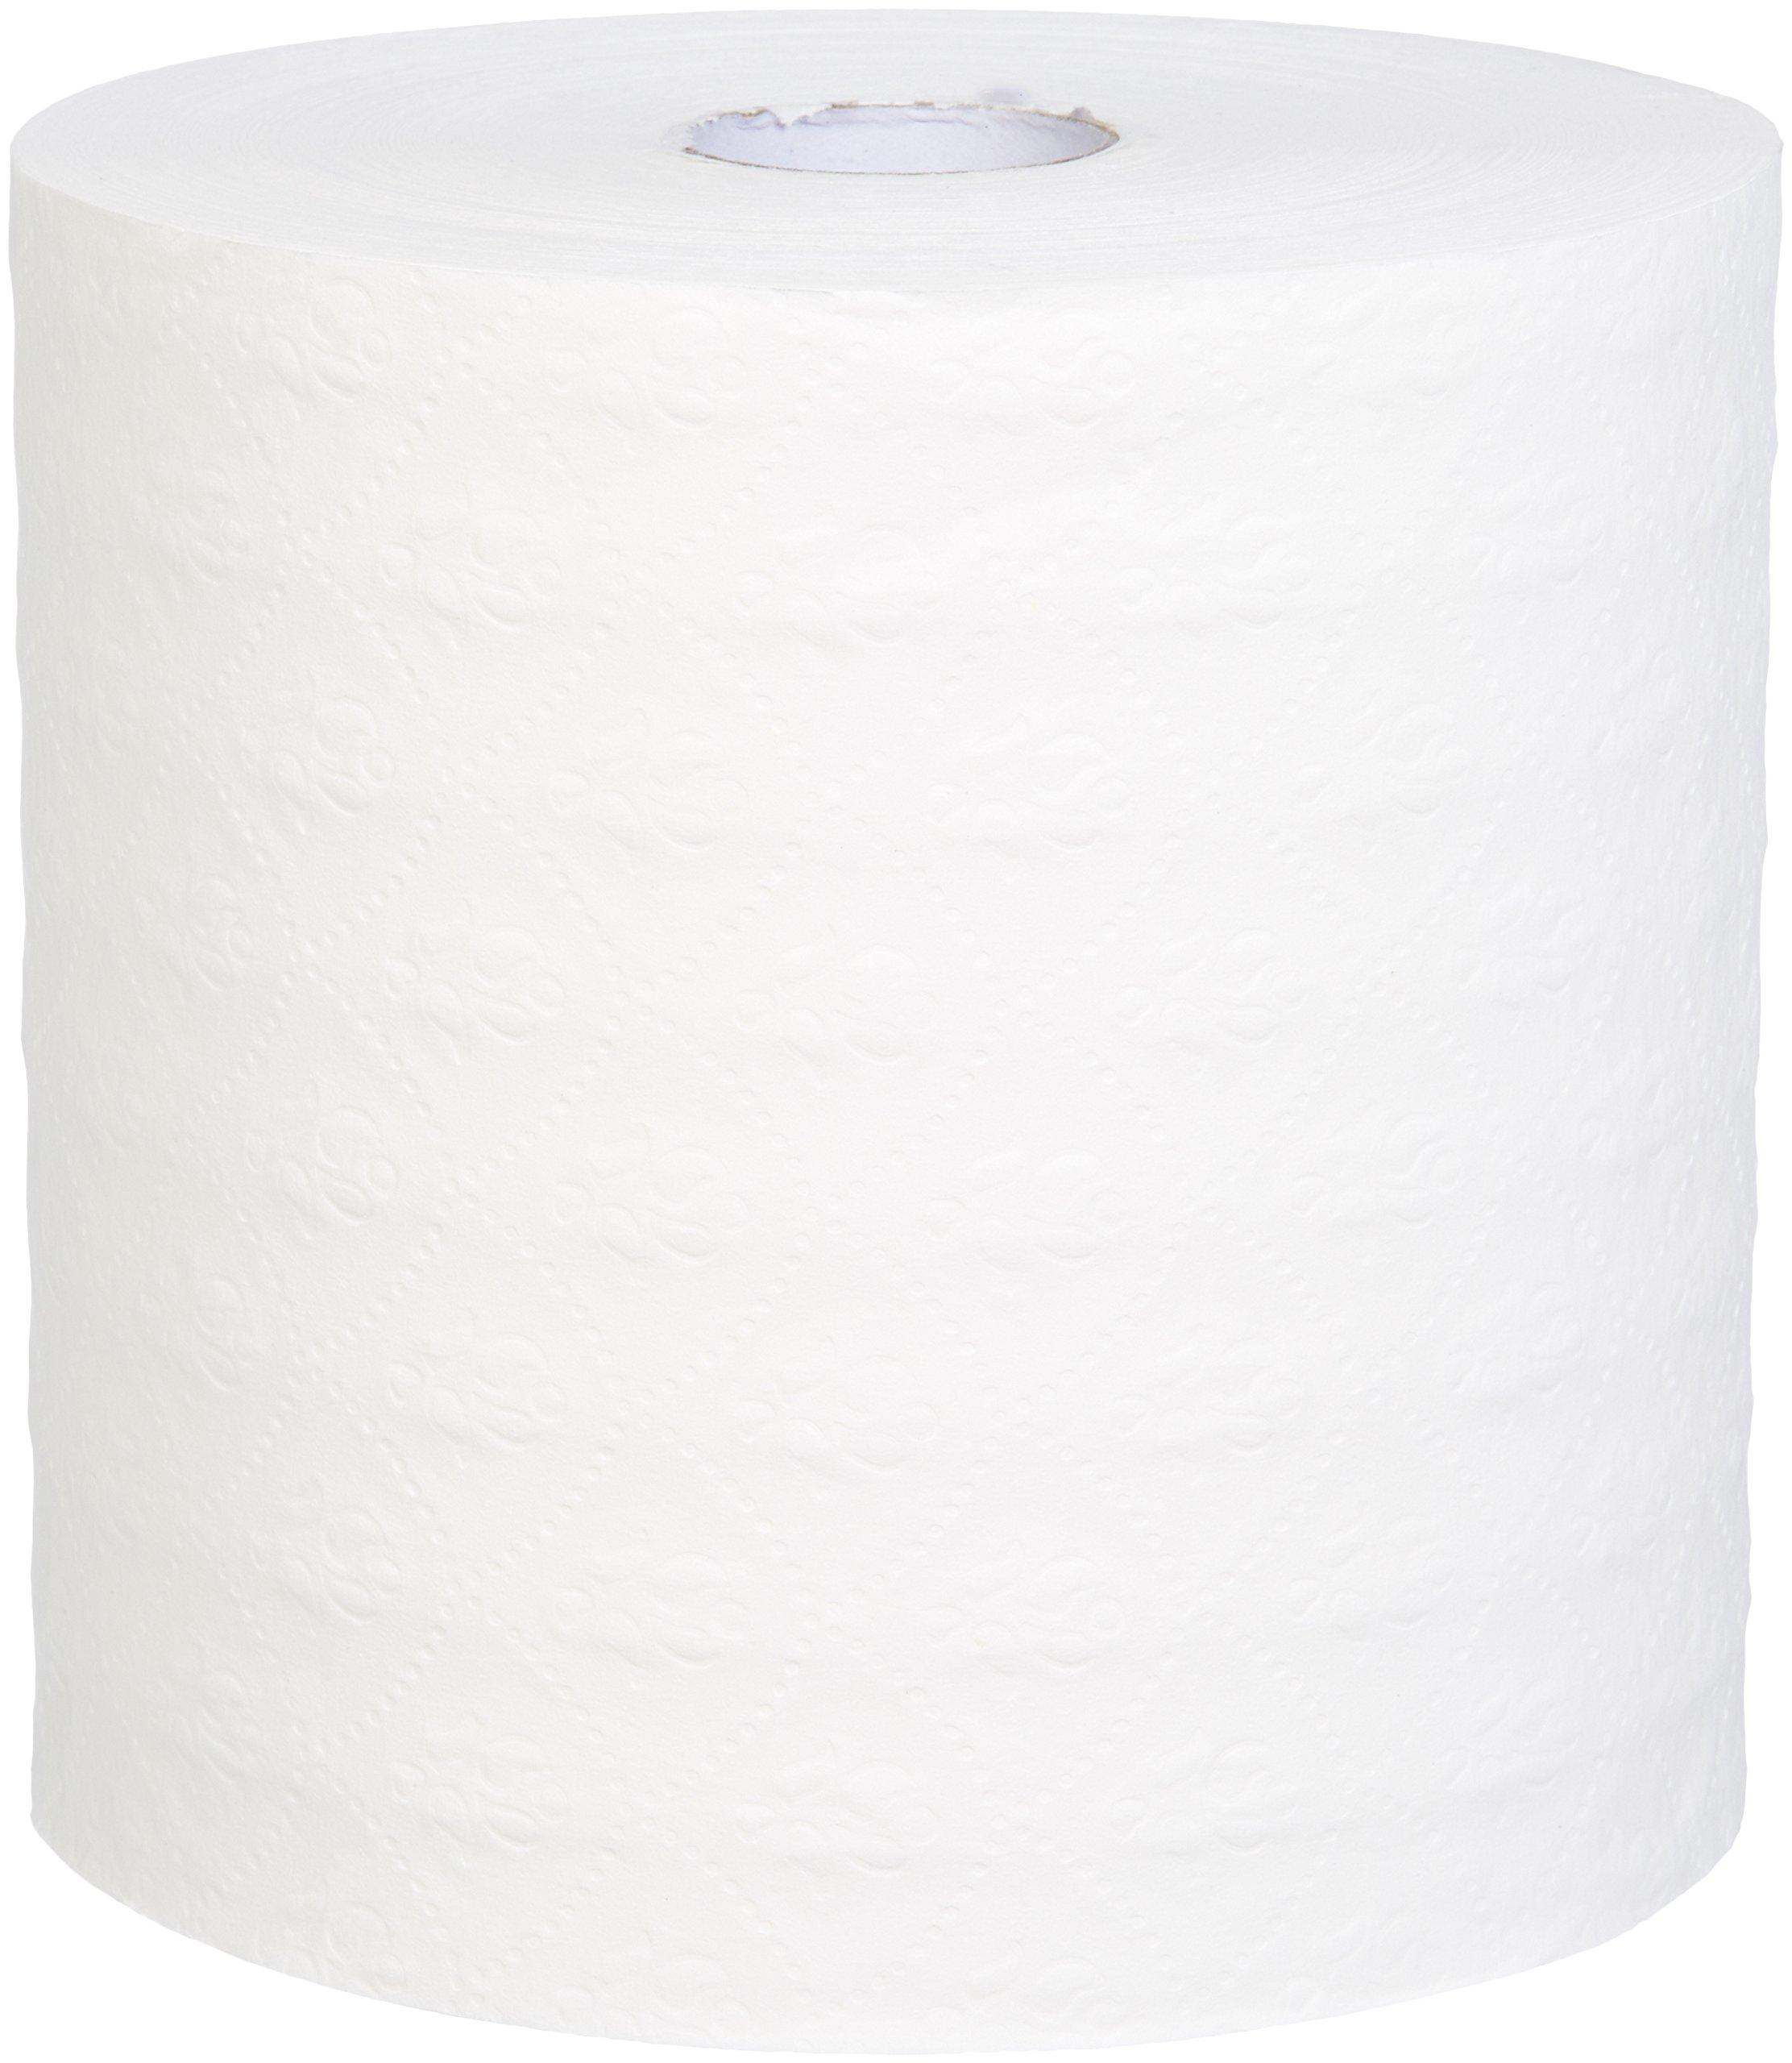 AmazonBasics Professional Hard Roll Towels, White, 950 Feet per Roll, 6 Rolls